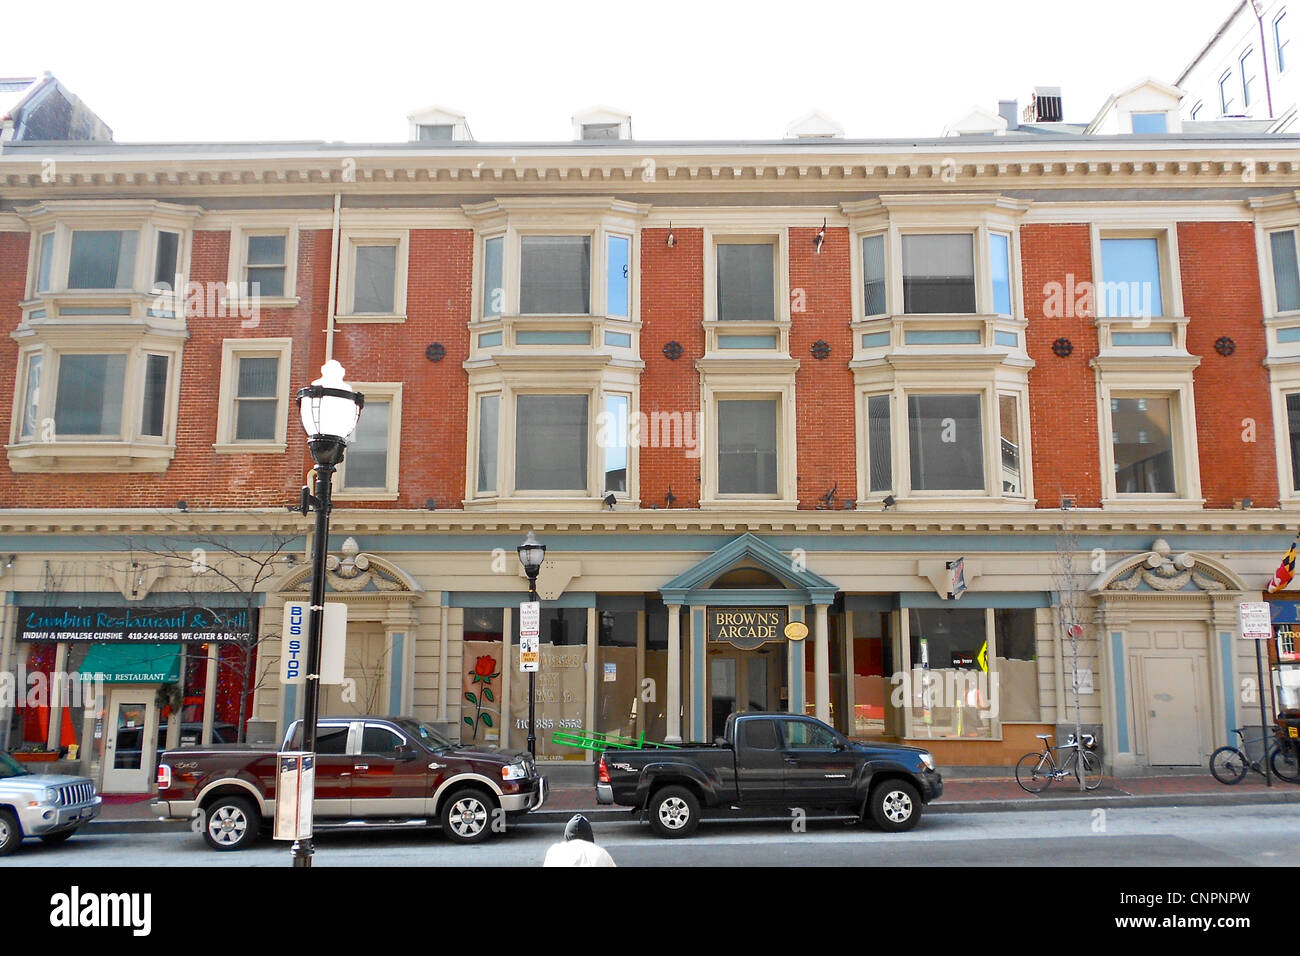 Browns Arcade auf dem NRHP seit 17. Januar 1983. 322-328 N. Charles Street in central Baltimore, Maryland. Stockbild